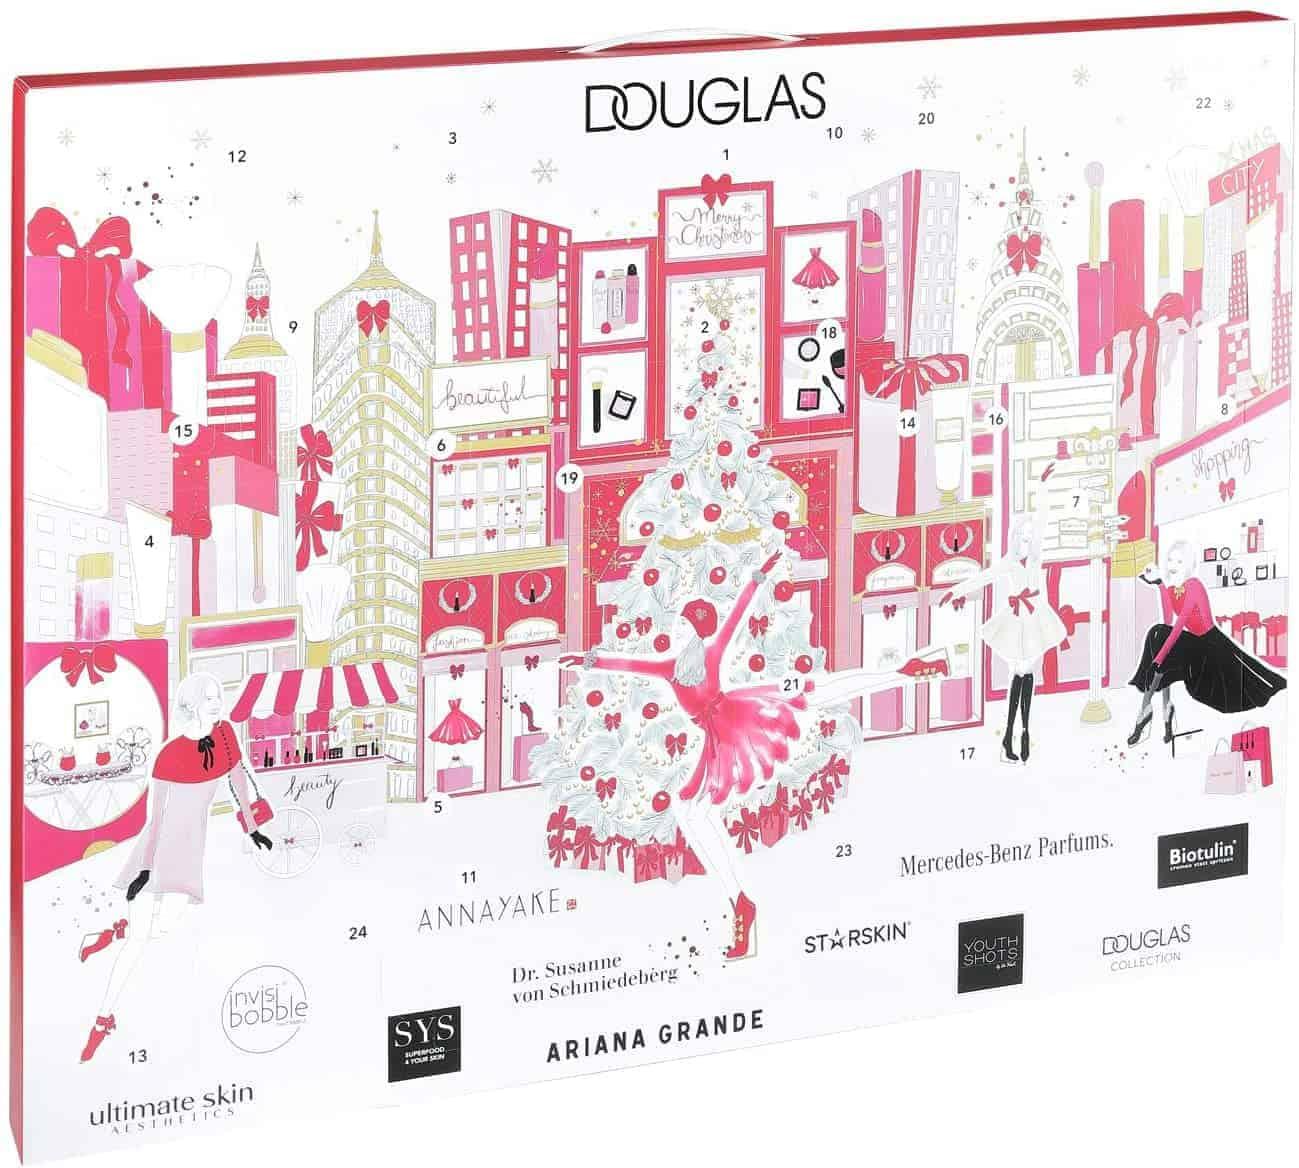 Douglas Adventskalender New Youk 2019